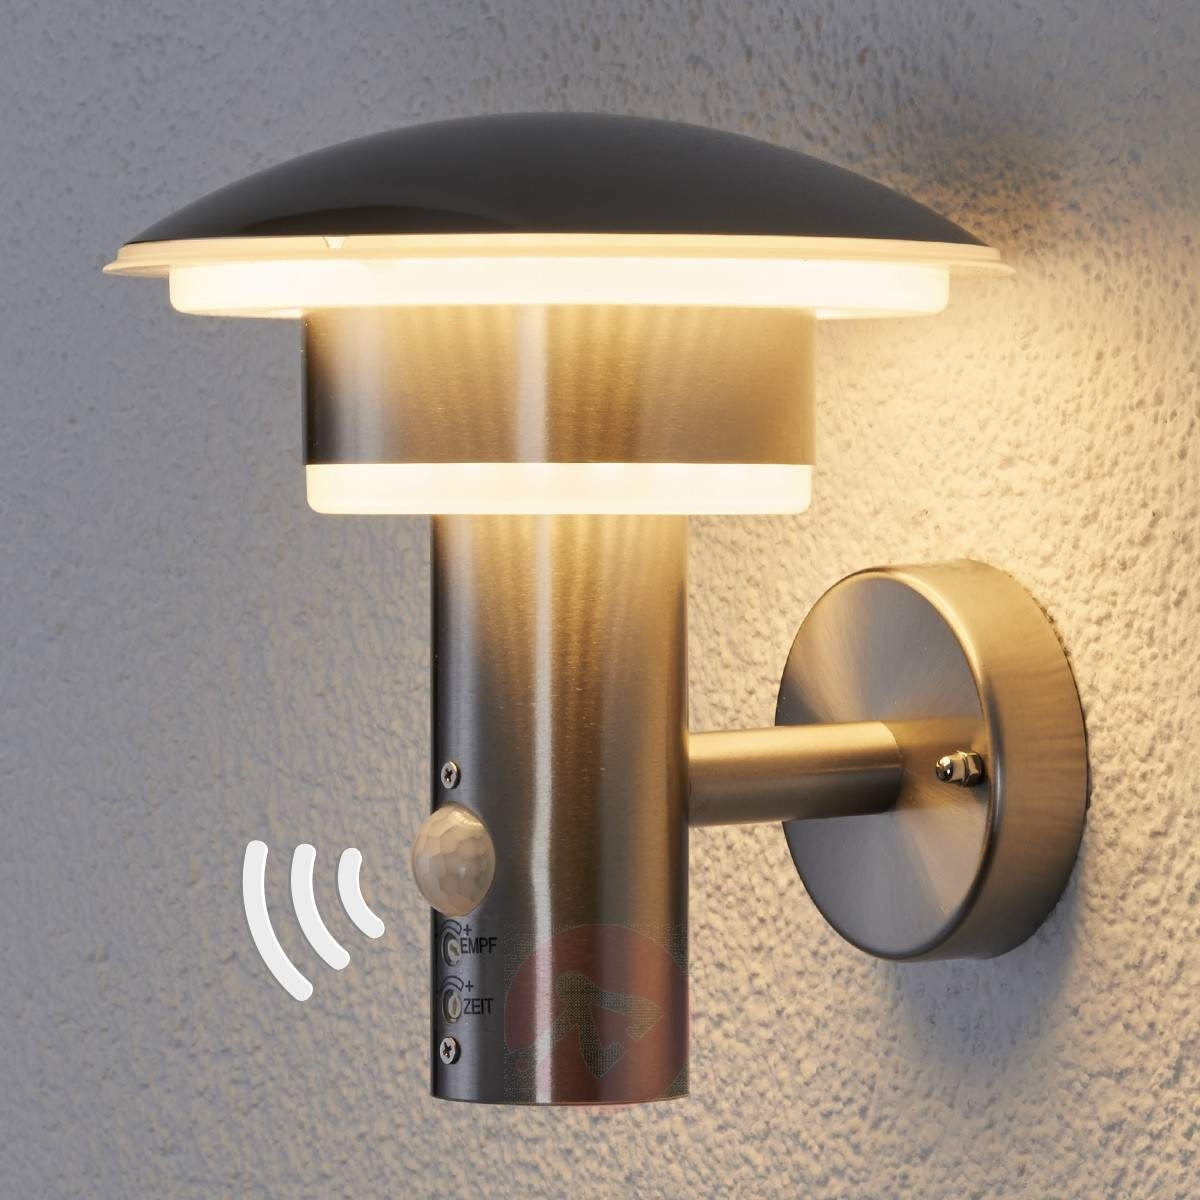 Outdoor Led Wall Lights With Sensor • Led Lights Design With Outdoor Led Wall Lights With Sensor (View 7 of 15)